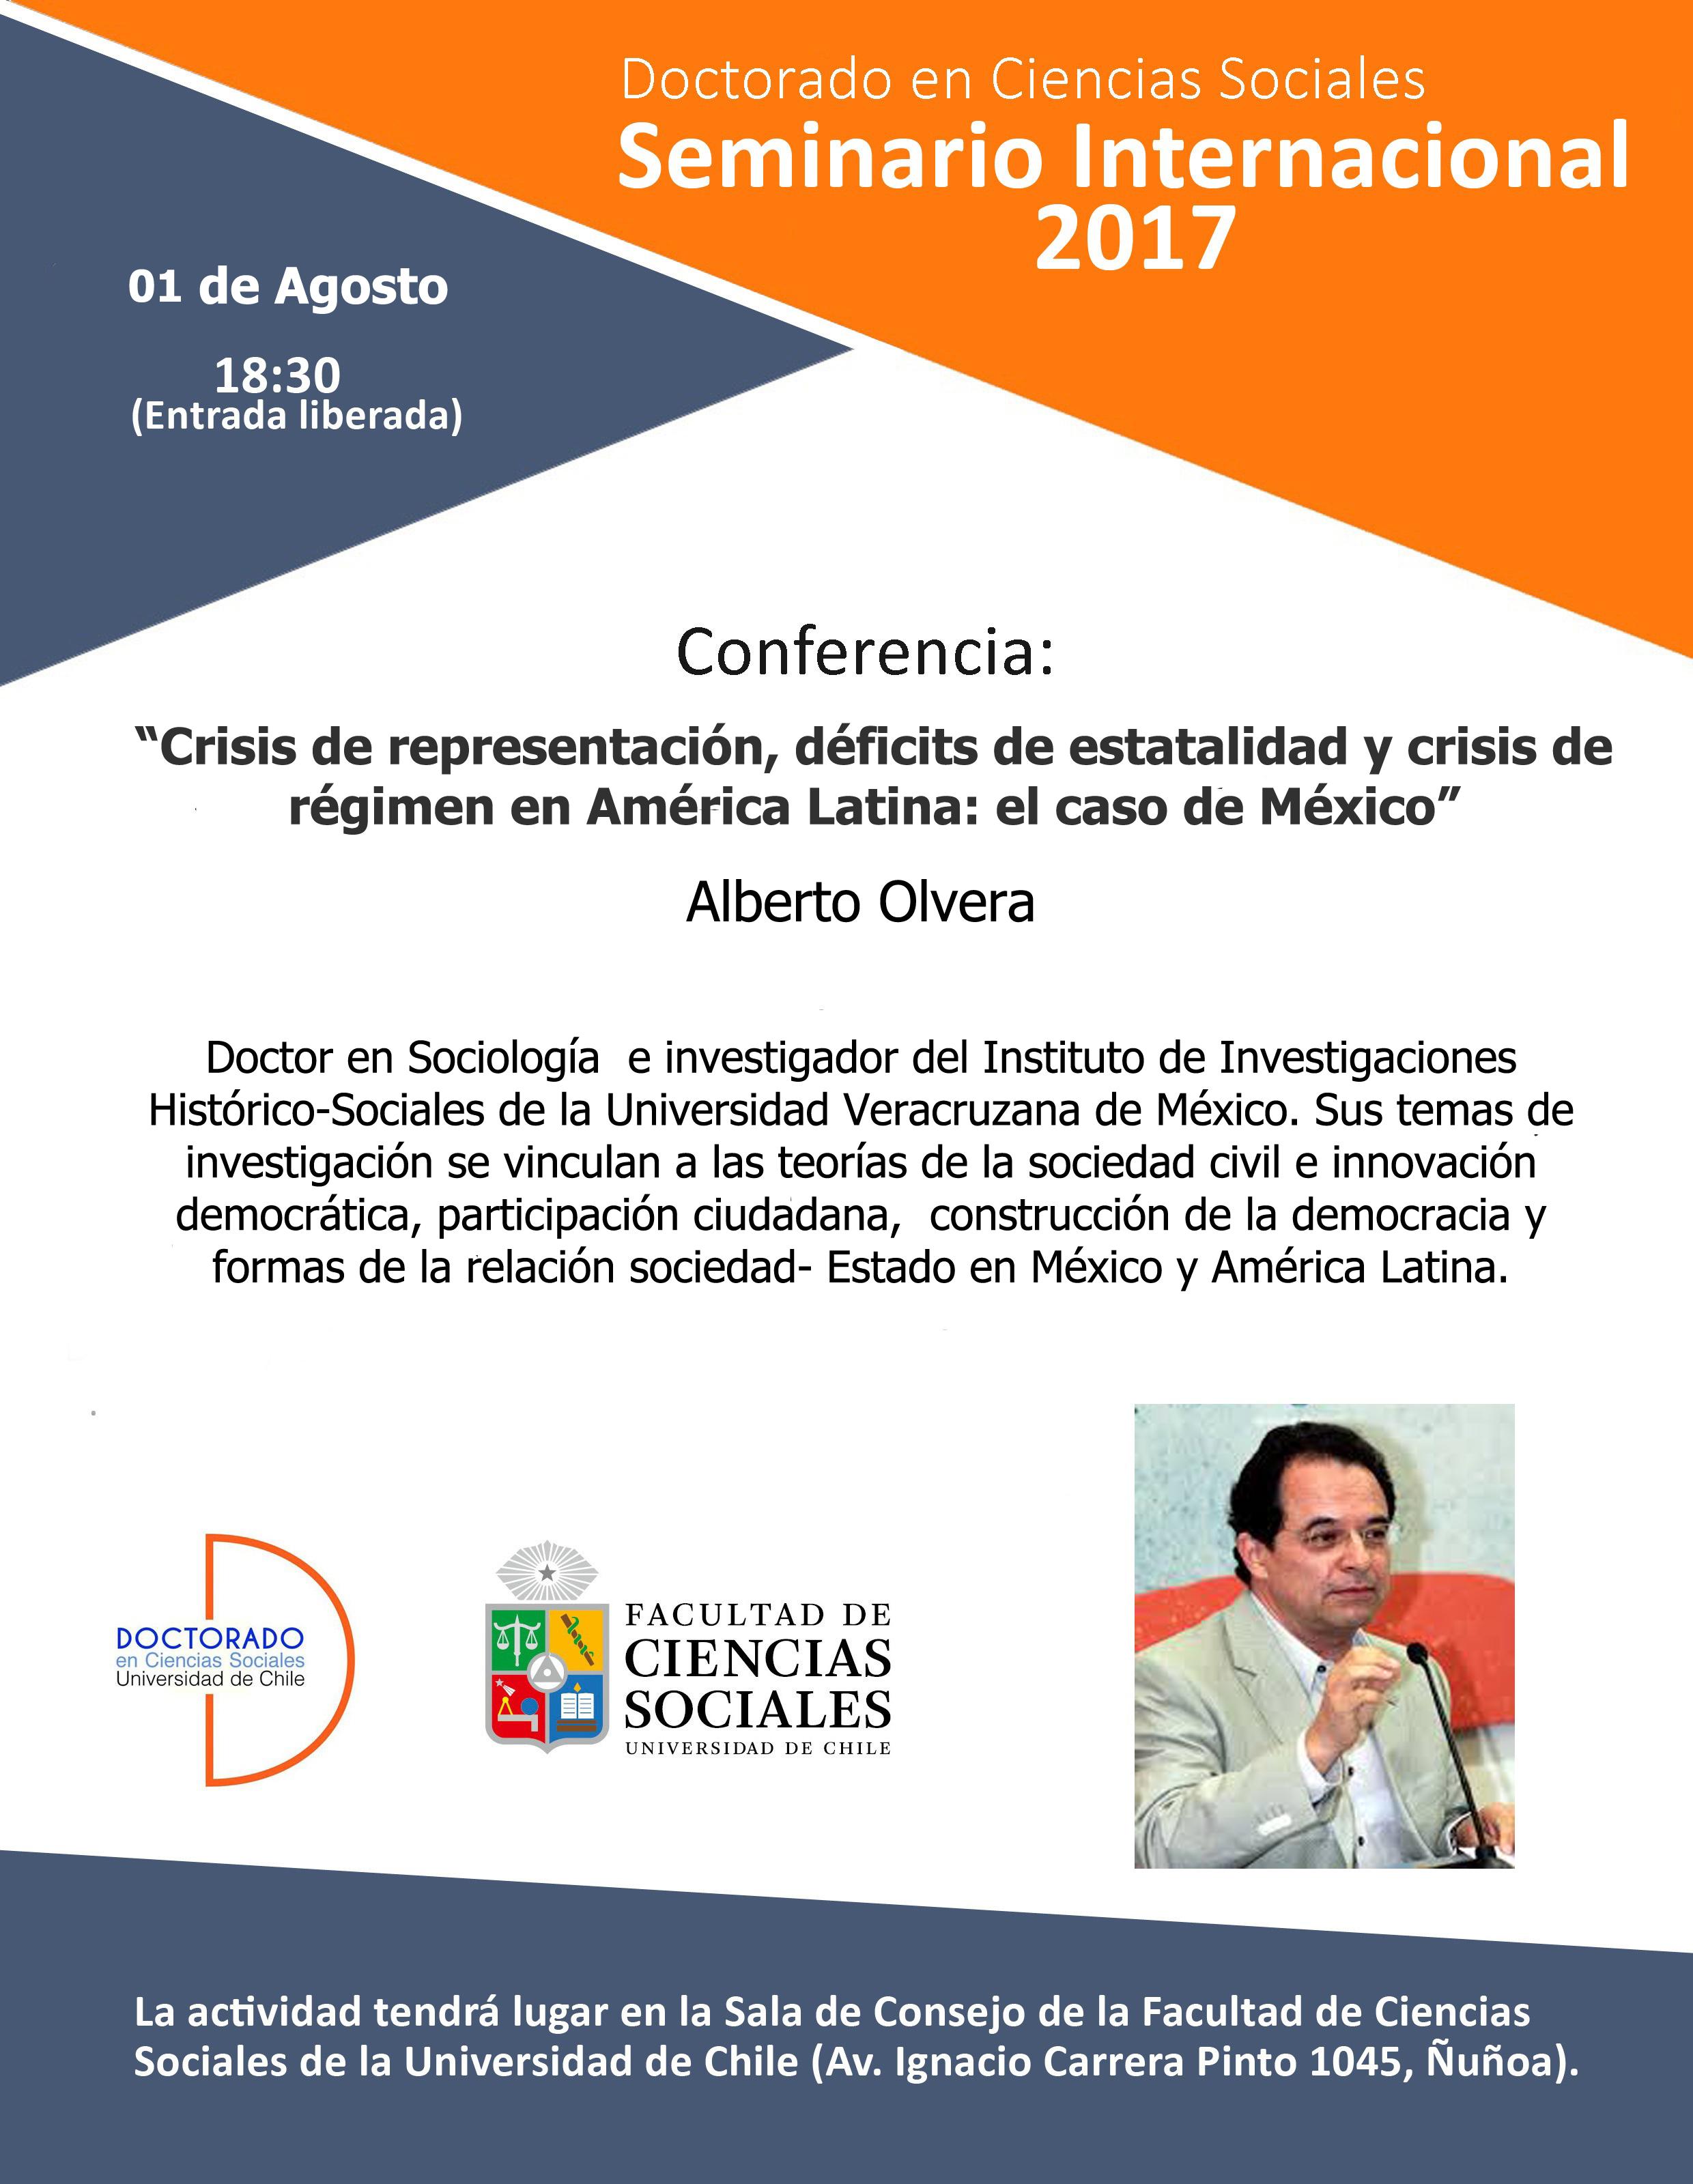 Tercera sesión Seminario Internacional 2017: Doctor Alberto Olvera